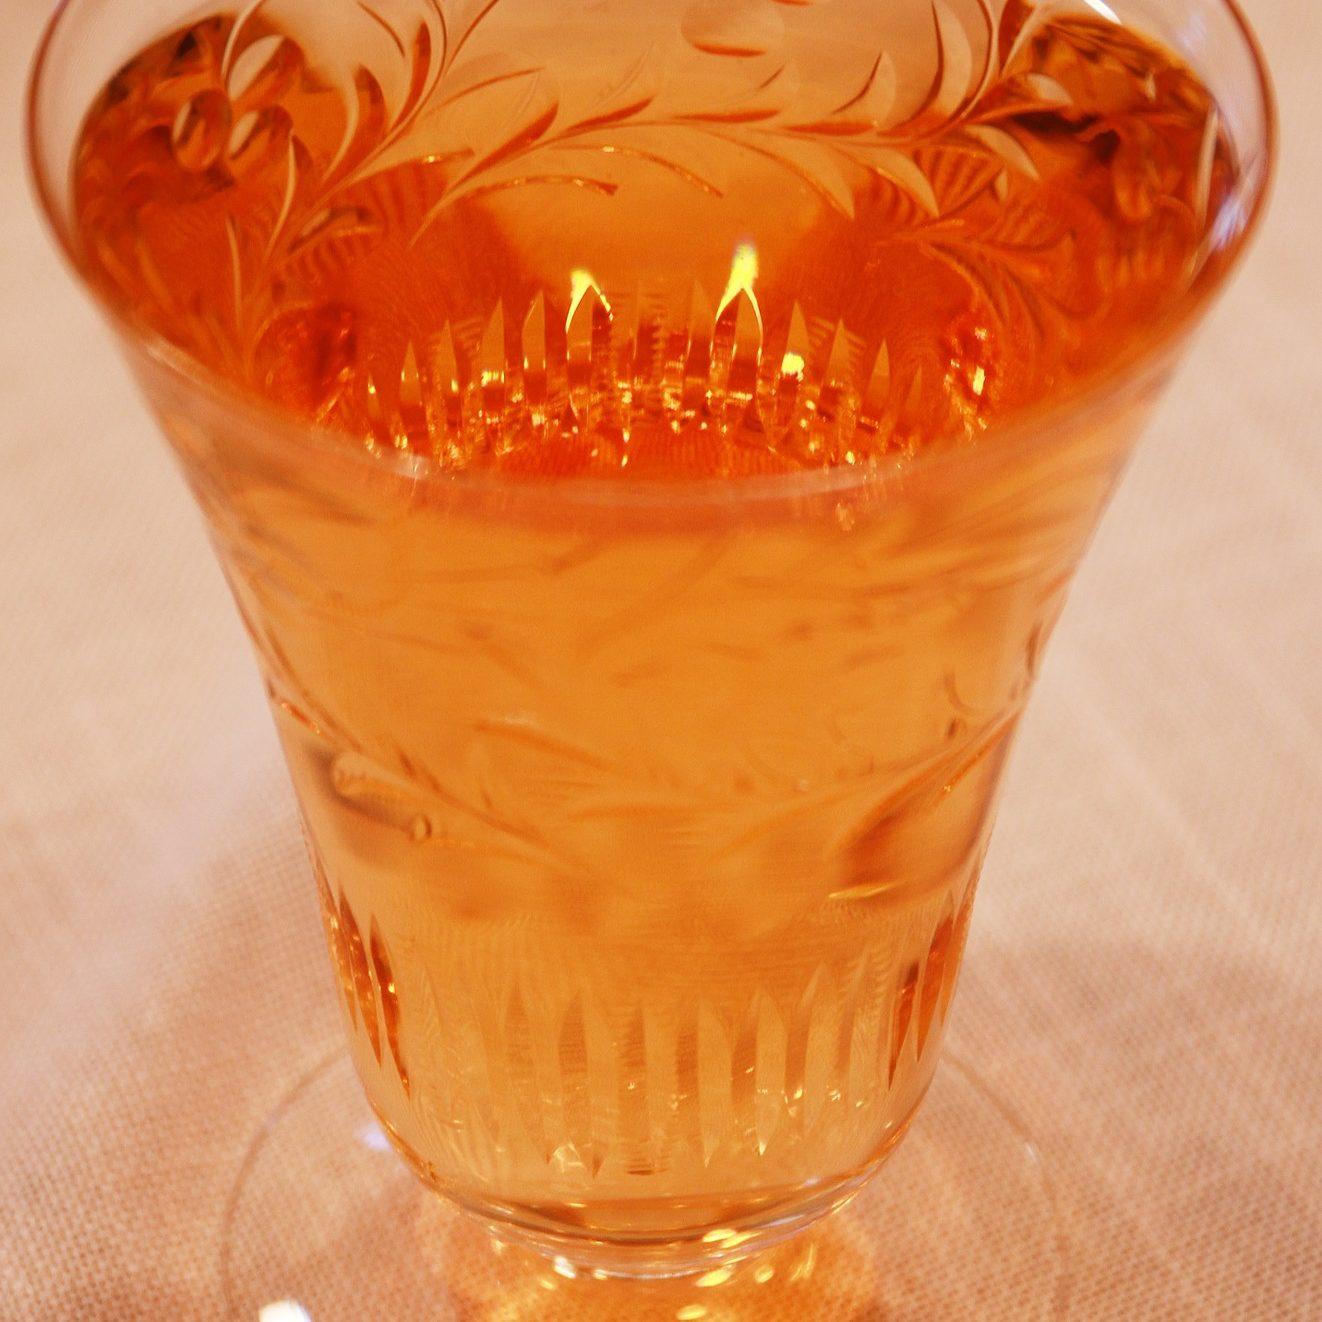 fermented-drink-950834_1920